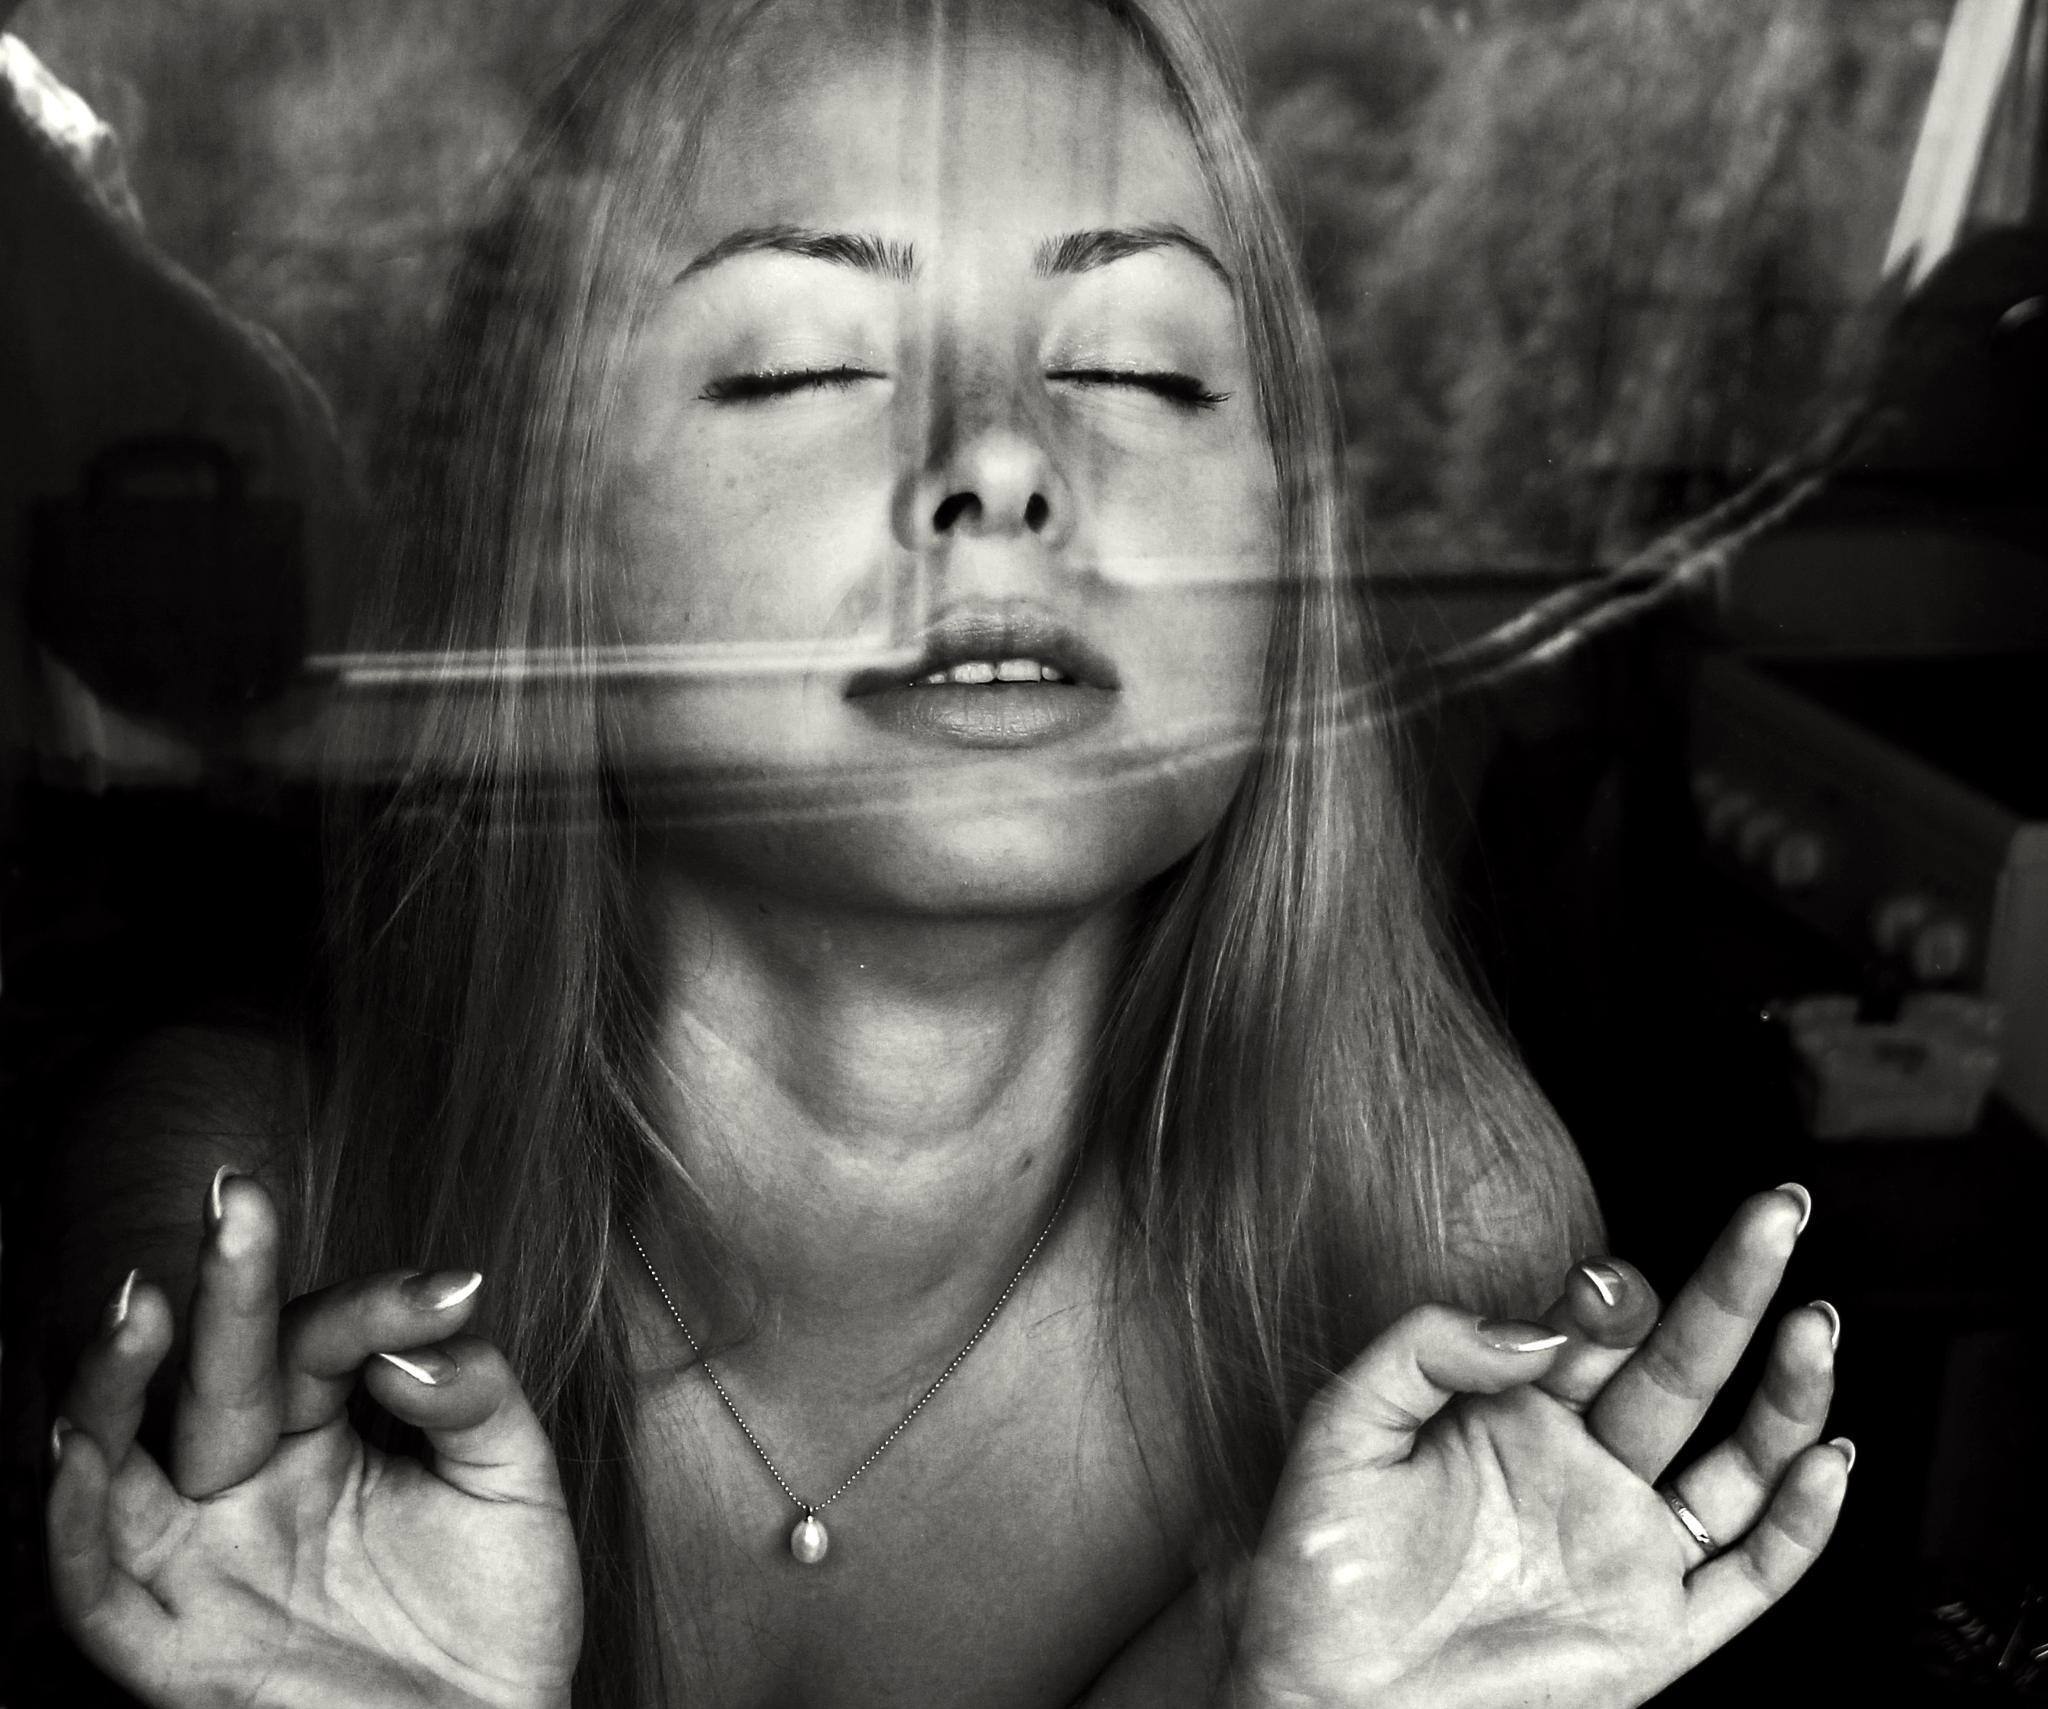 Inhaling summer by Сергей Юрьев